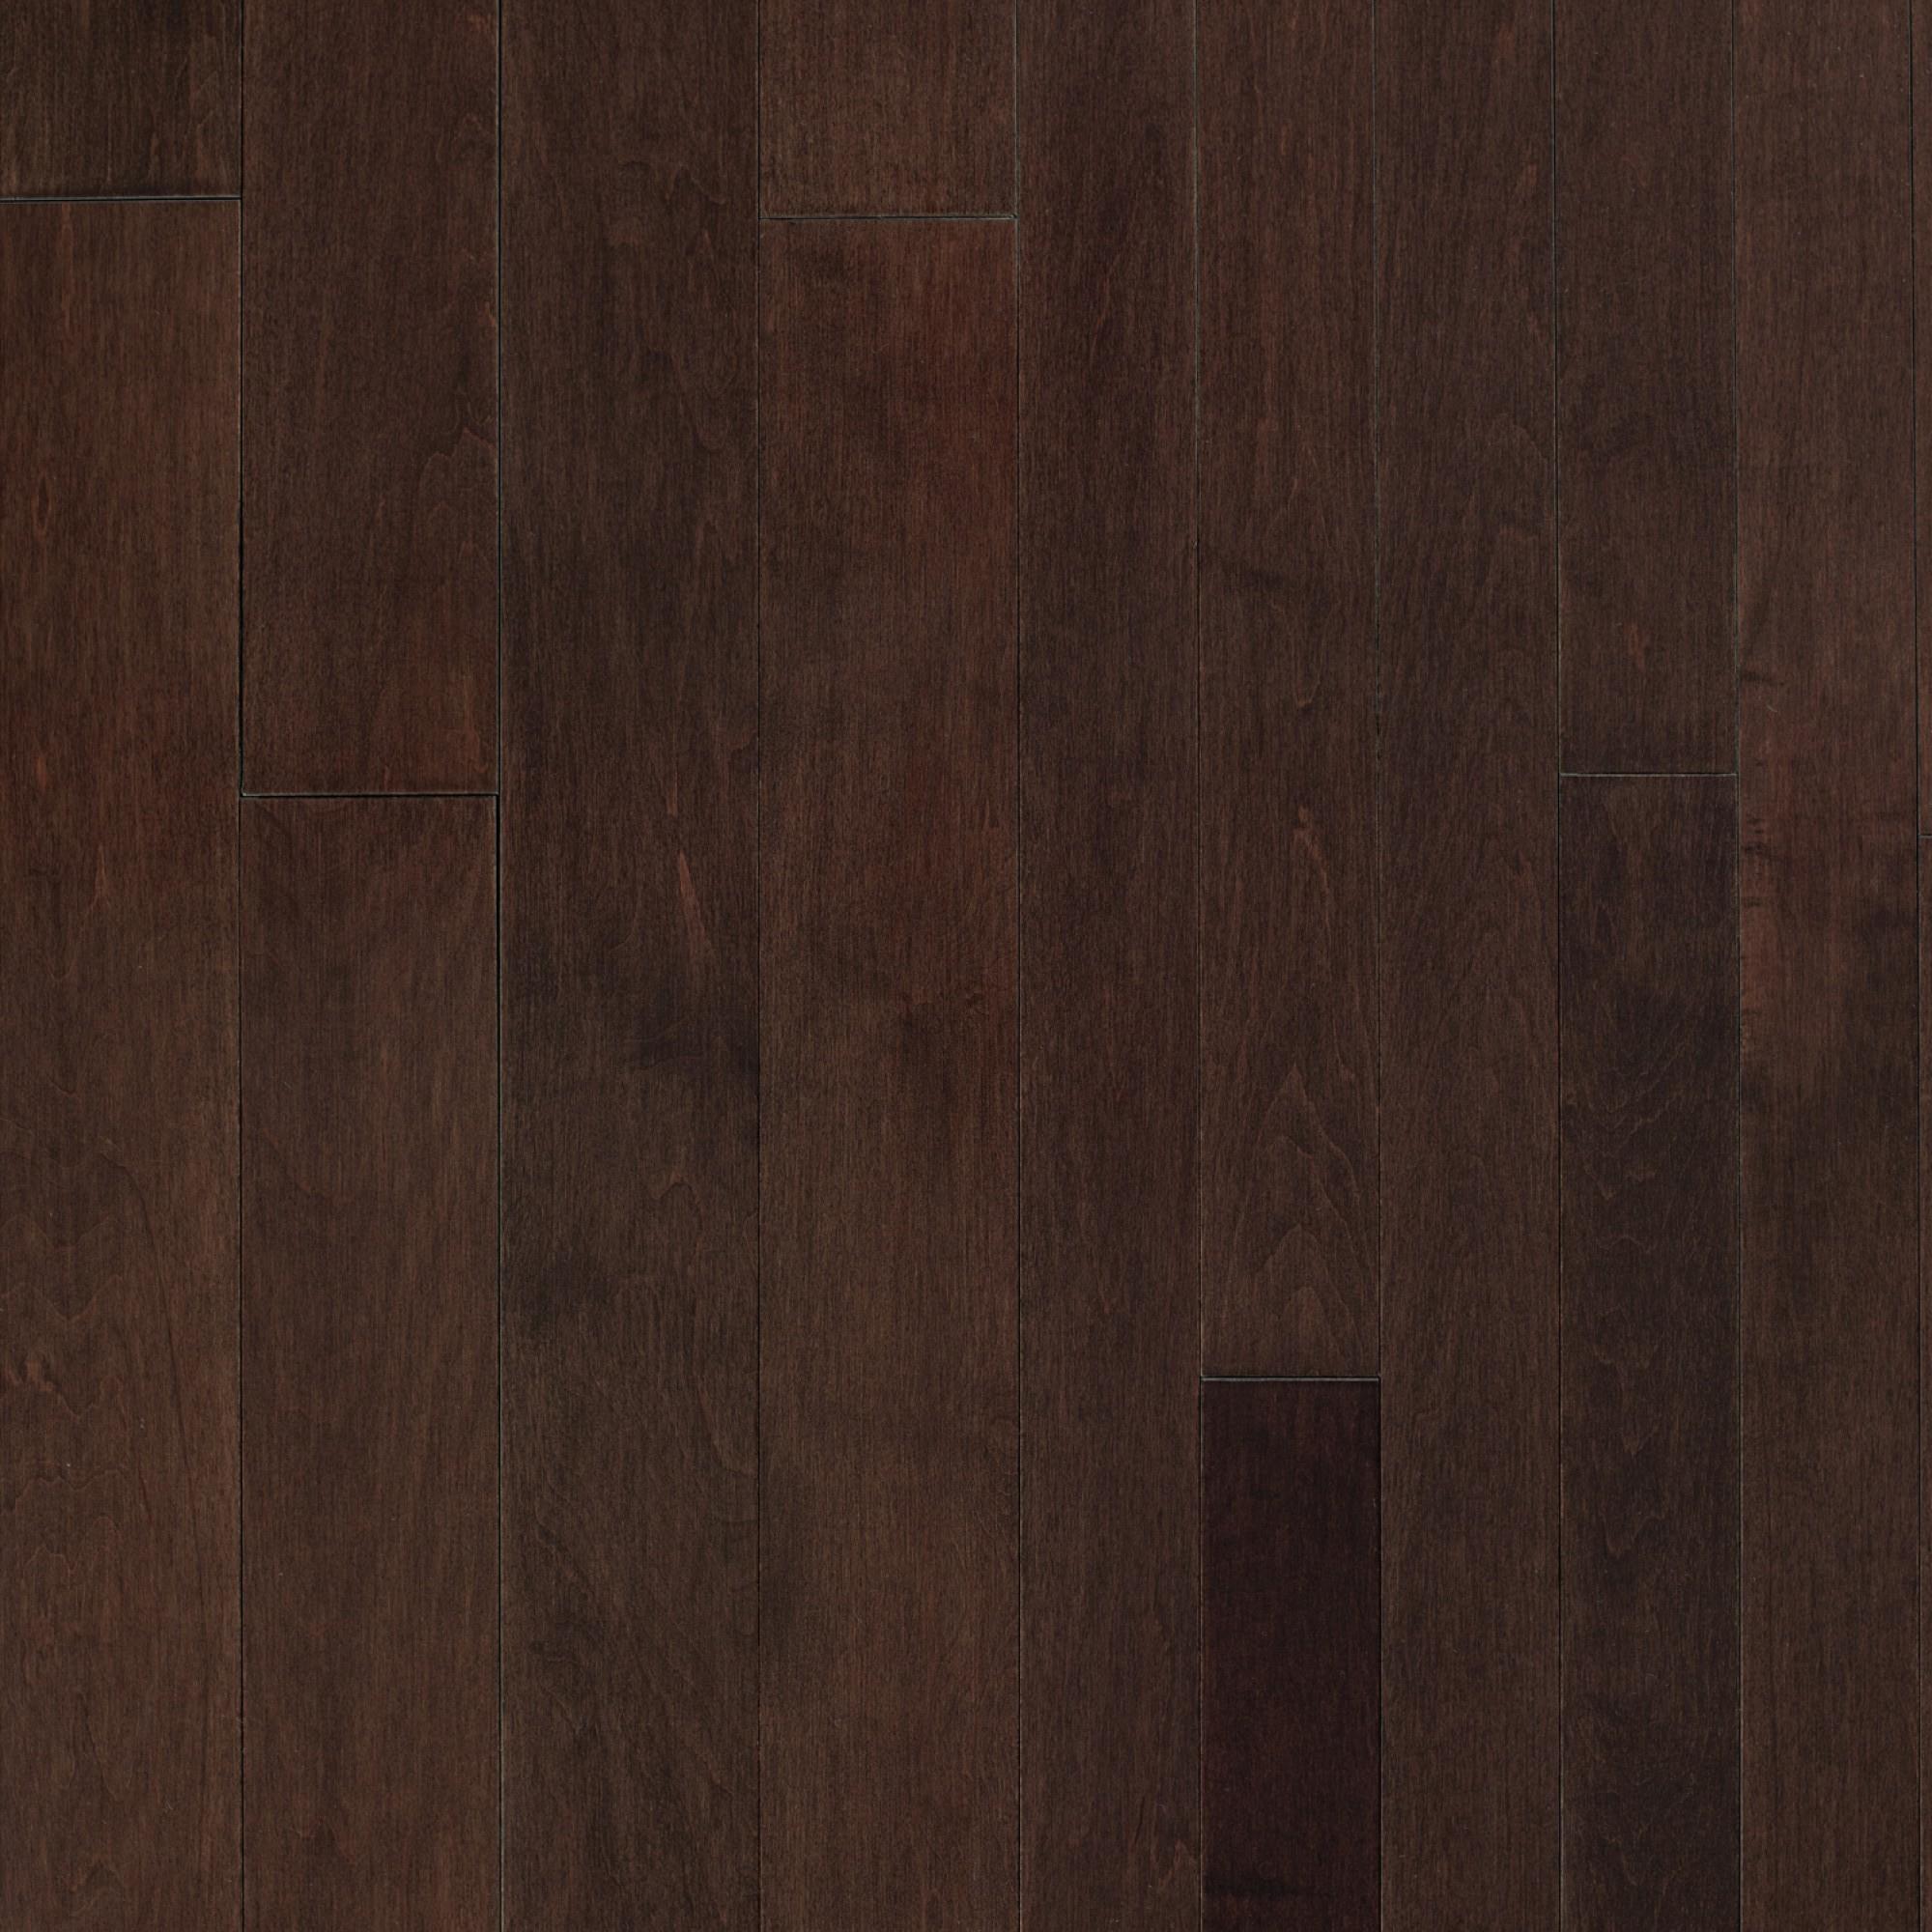 Maple Godiva